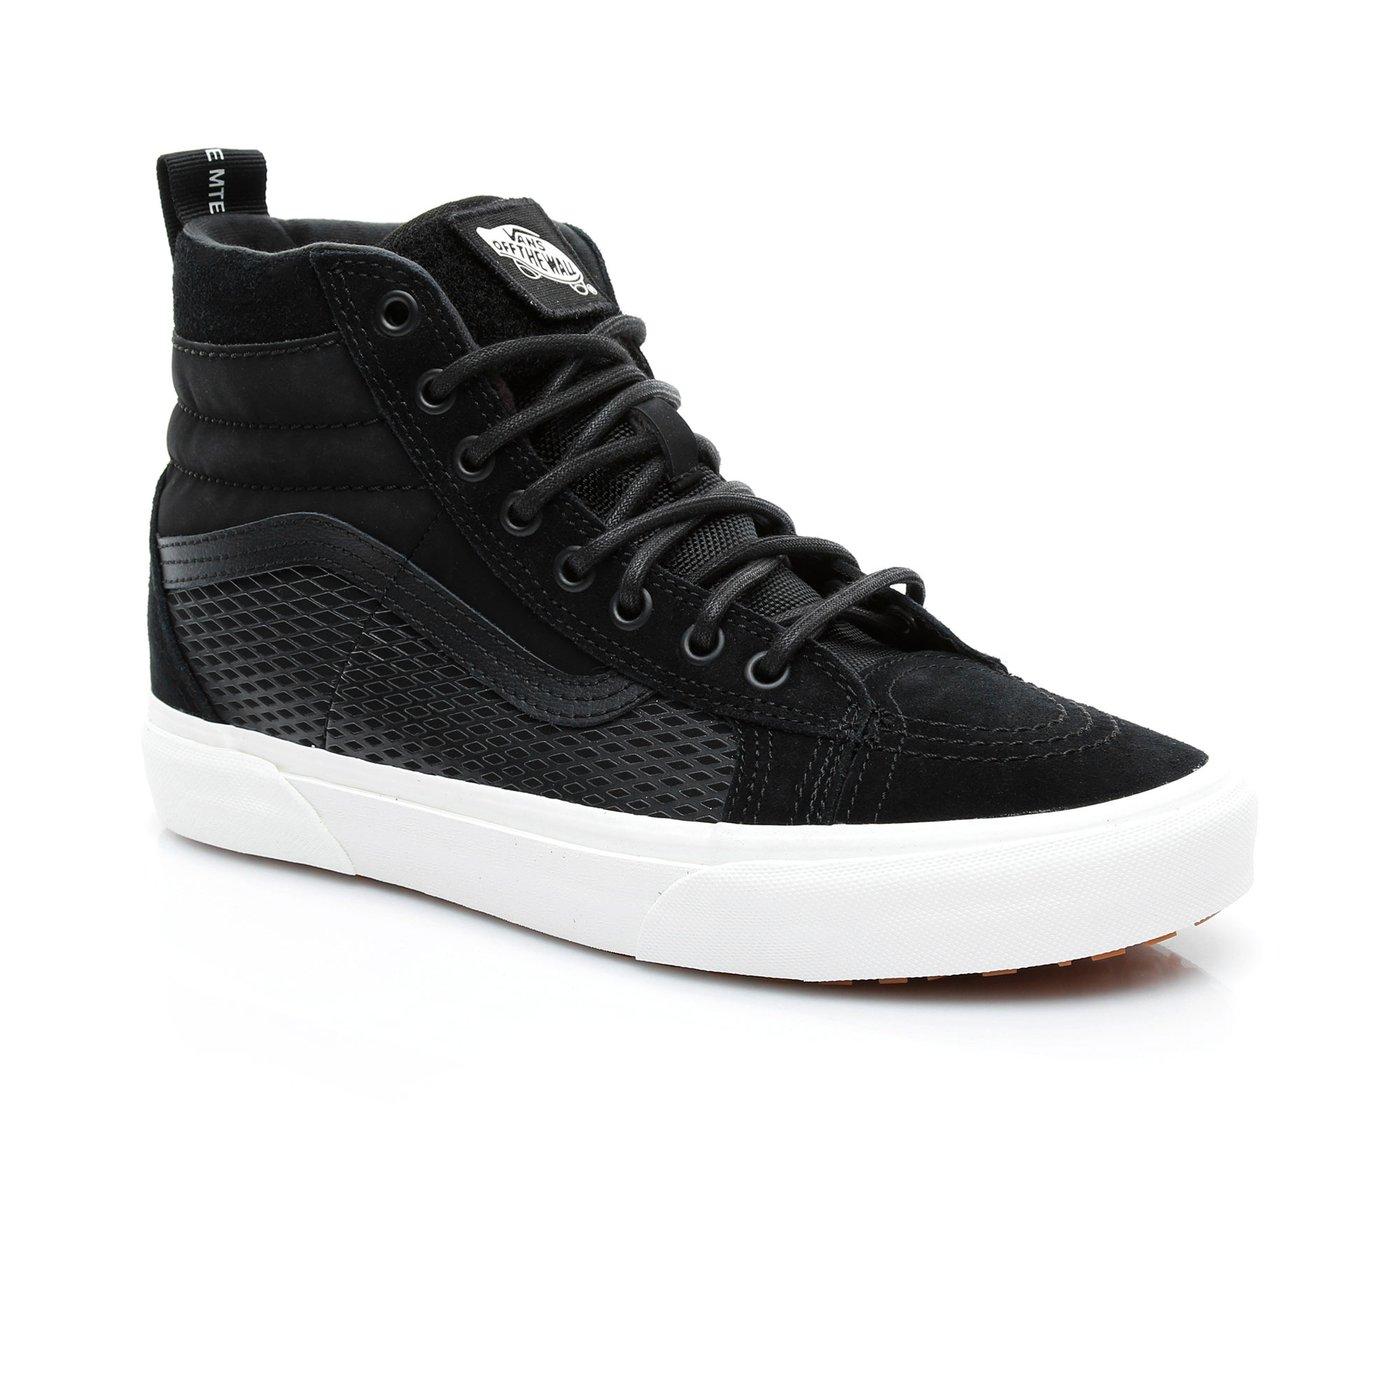 8b05fddbbb Vans UA SK8-Hi 46 MTE DX Siyah Erkek Sneaker Erkek Sneaker 3219028 ...